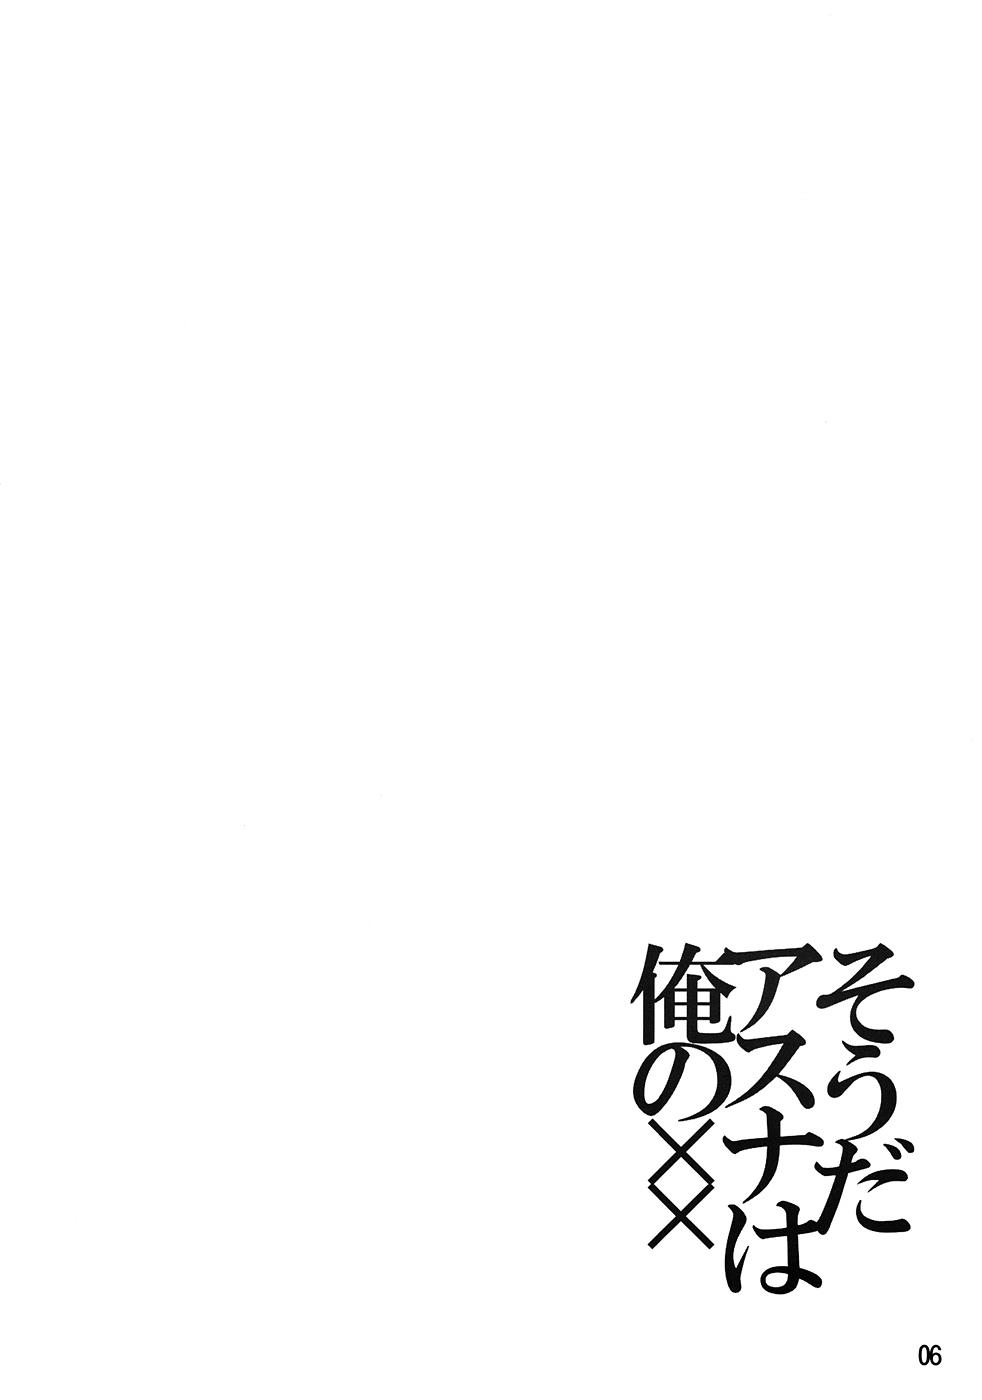 Souda Asuna wa Ore no XX | That's right, Asuna is my XX 4